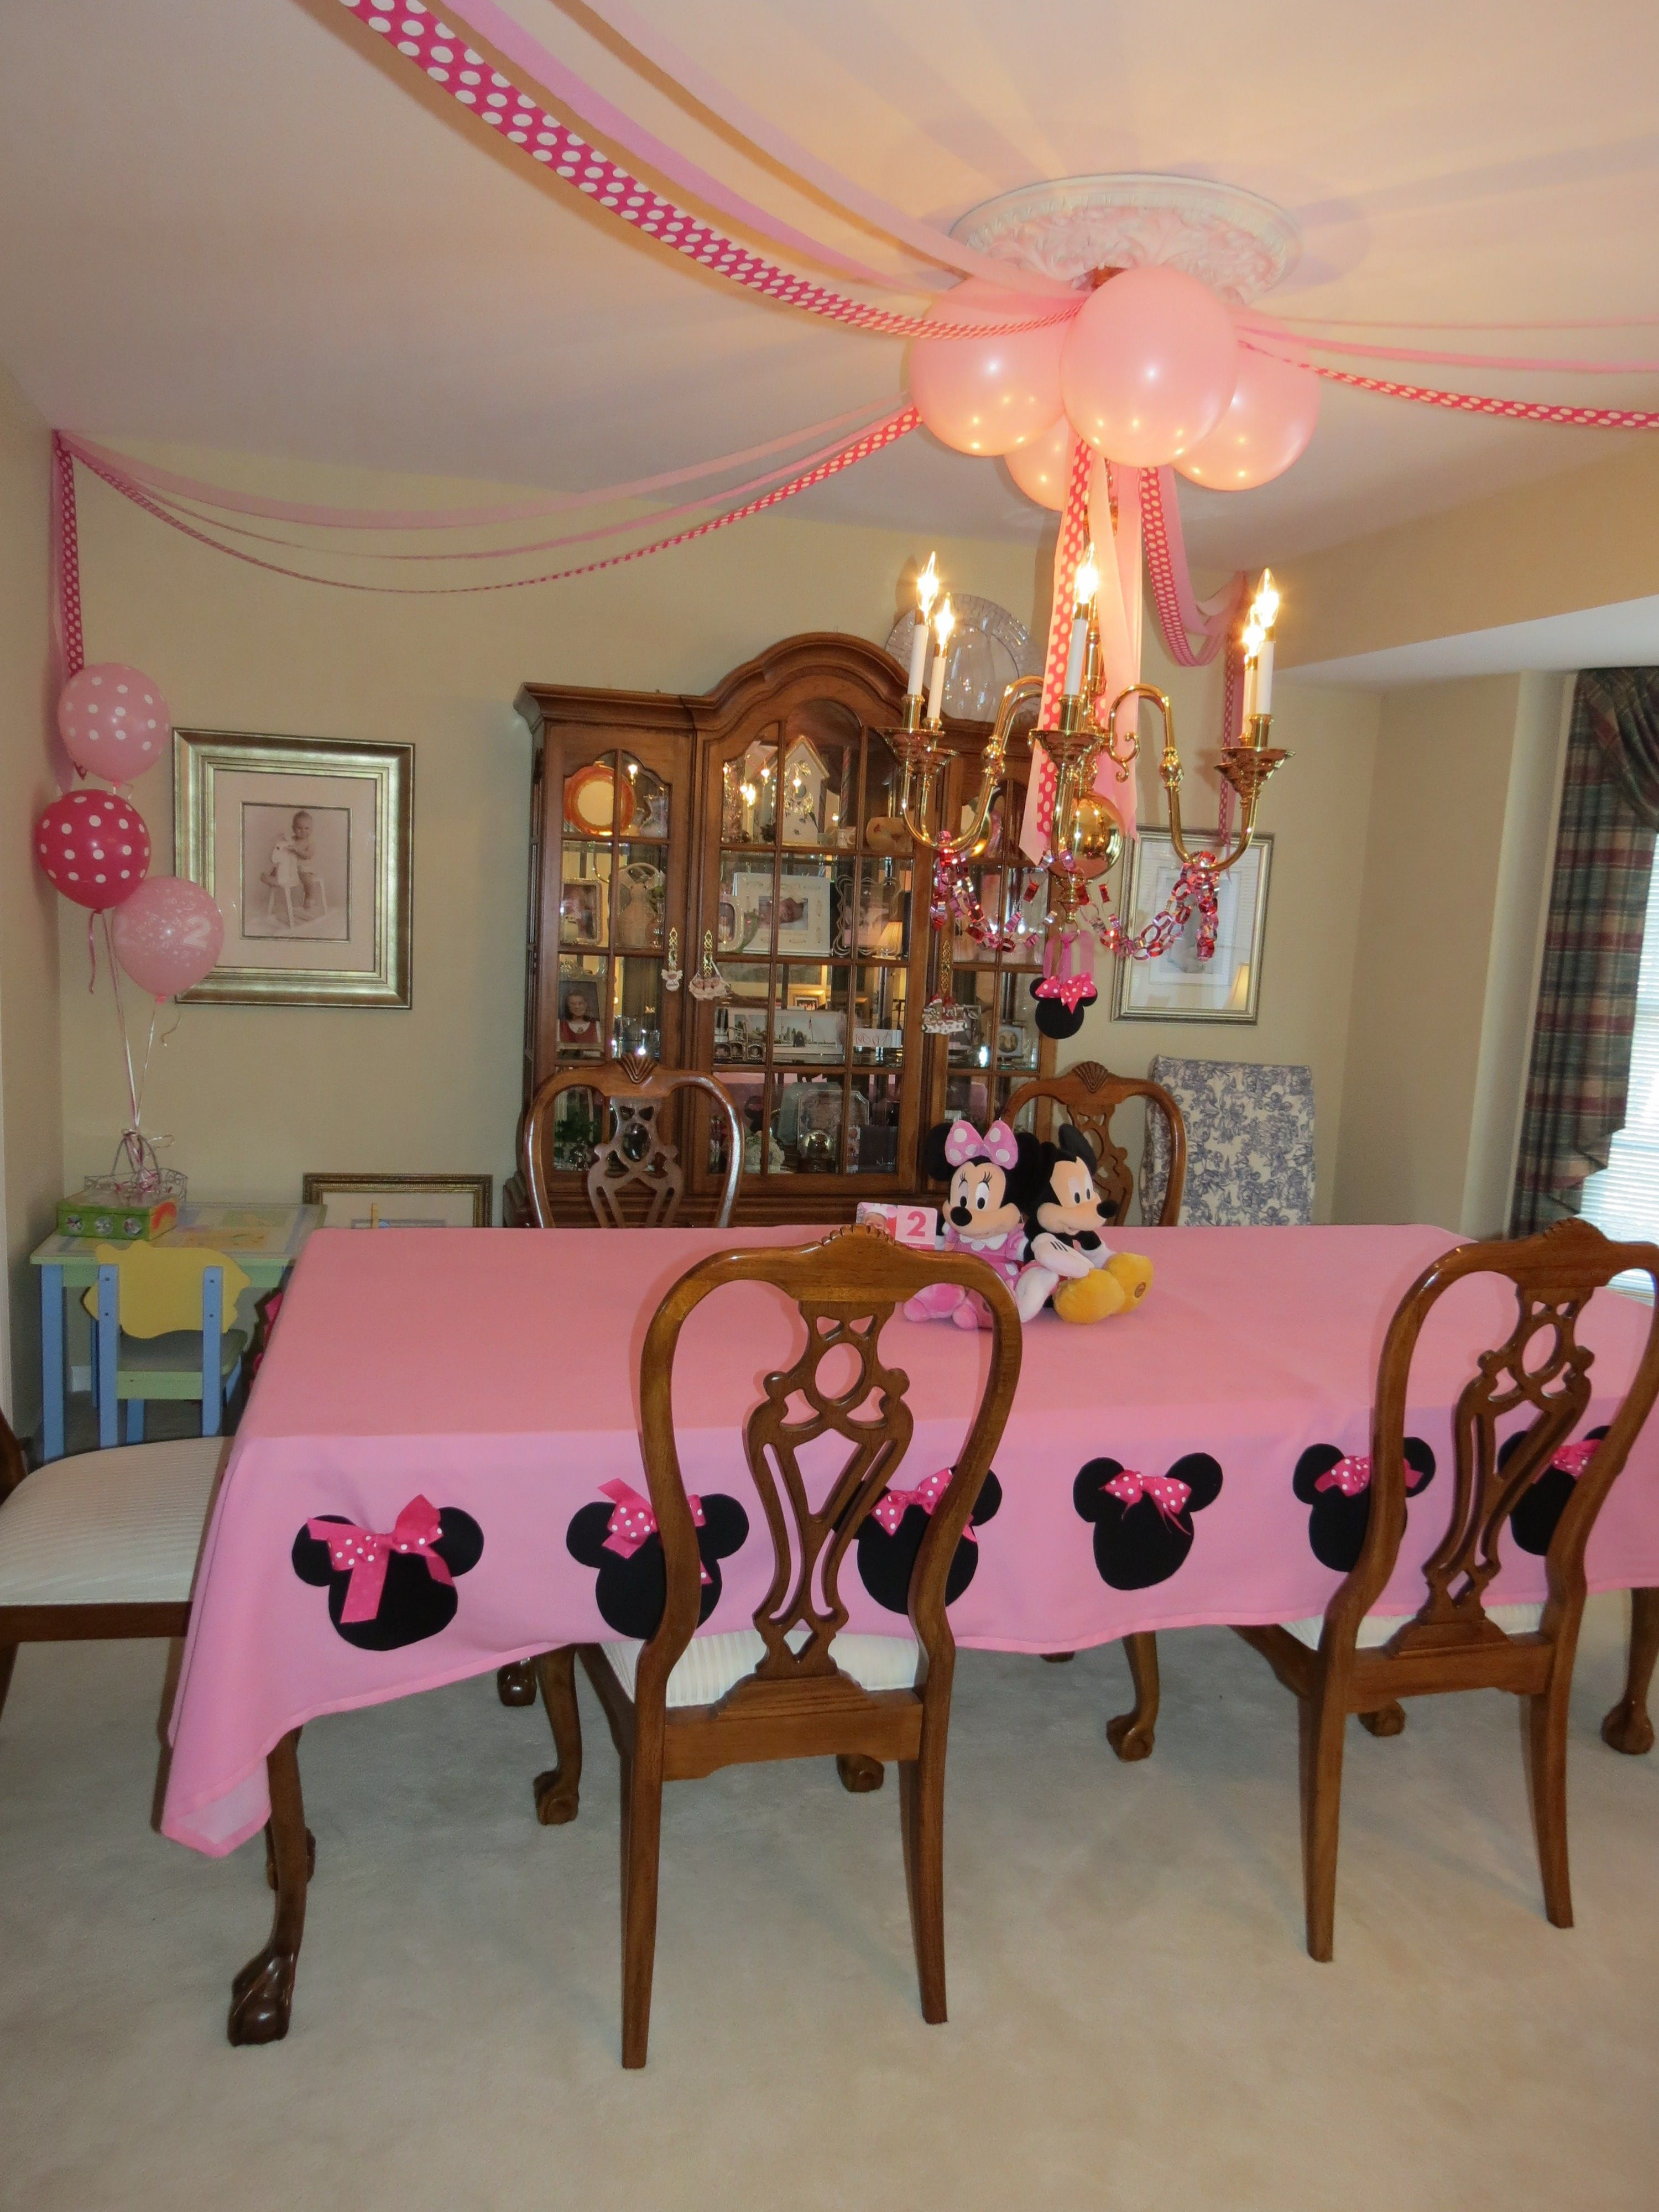 DIY Minnie Mouse Tablecloth  Party ideas  Pinterest